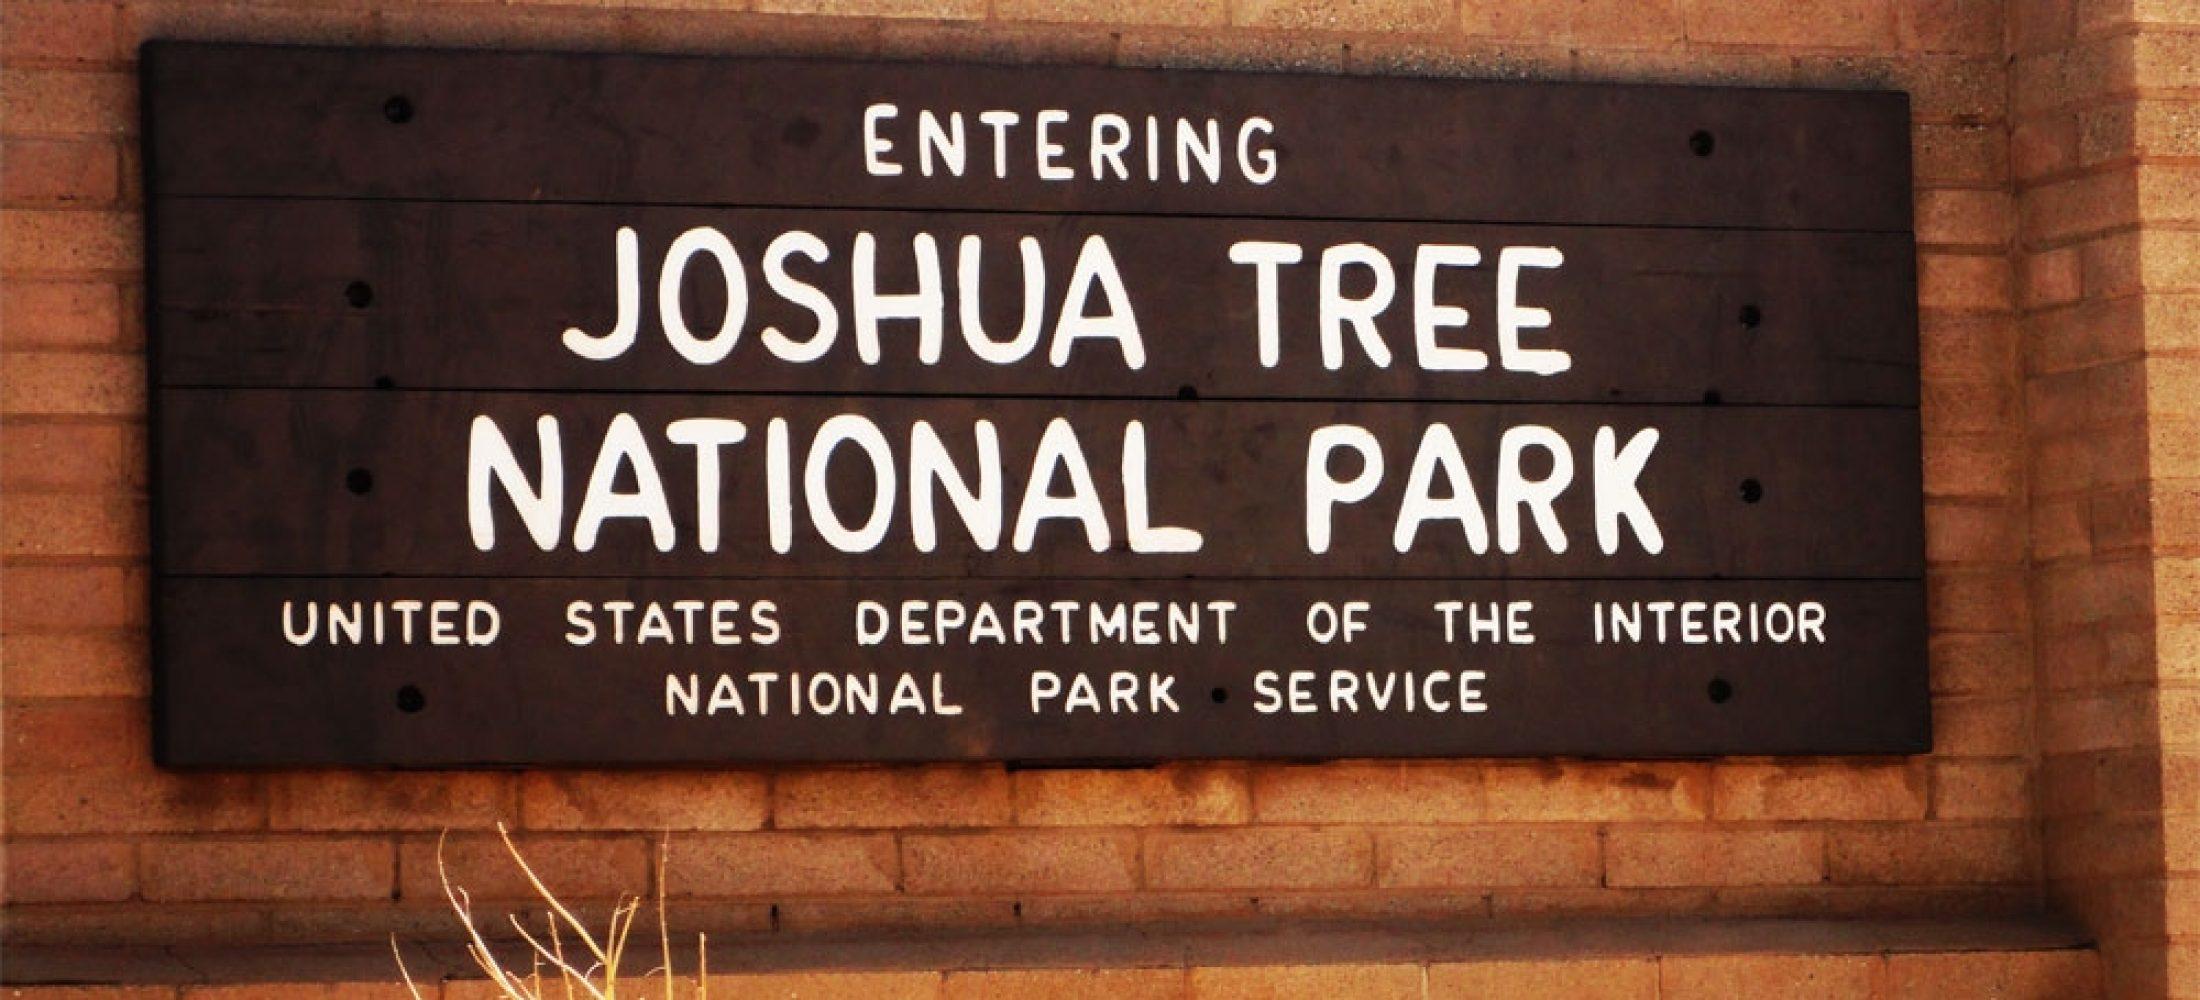 joshua-tree-park-entrance